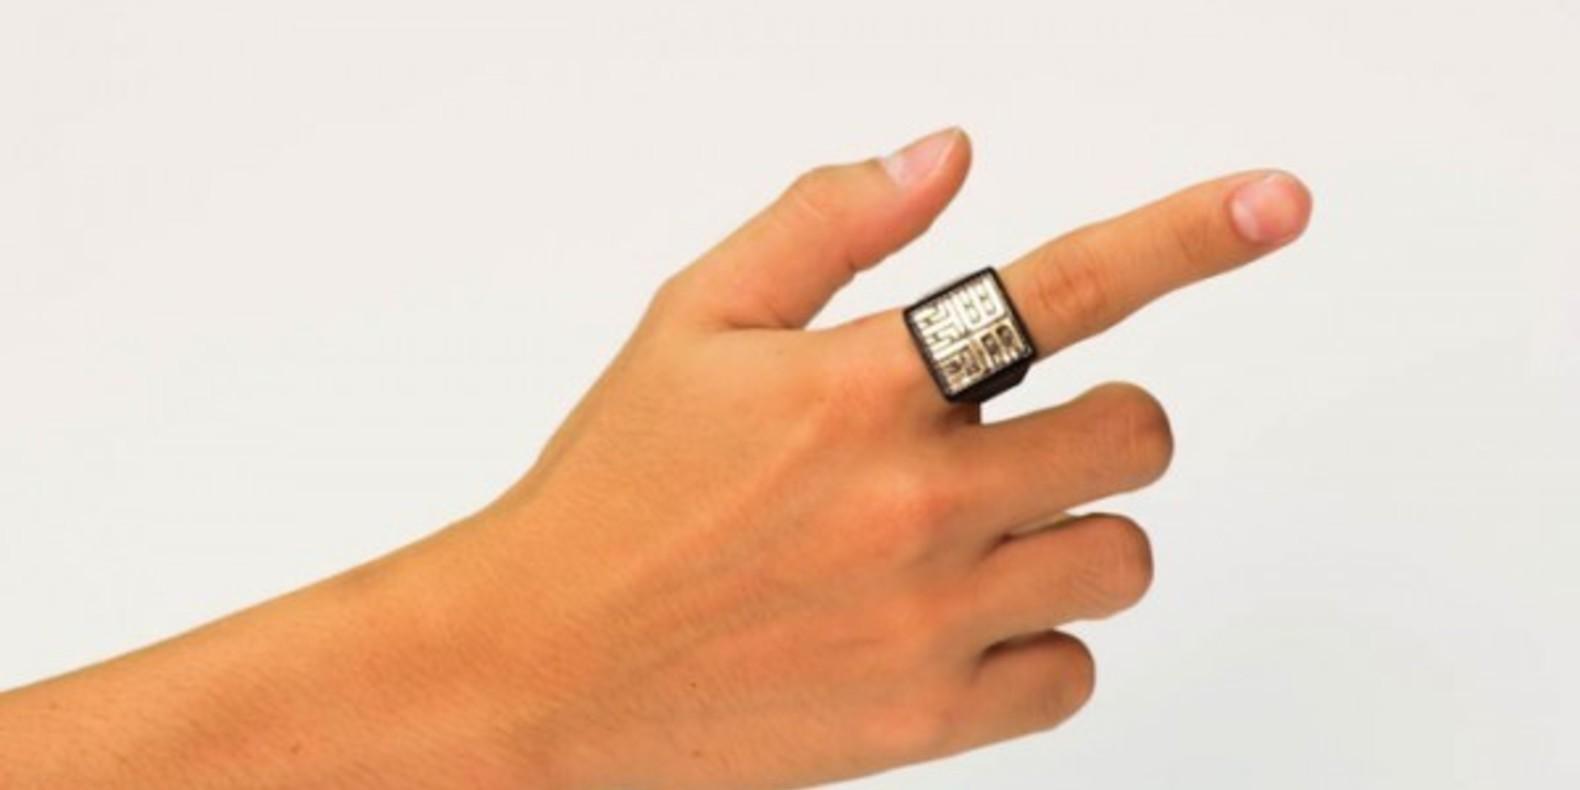 sesame ring theory 3D printed bague imprimée en 3D cults3D fichier 3D kickstarter boston MIT 3